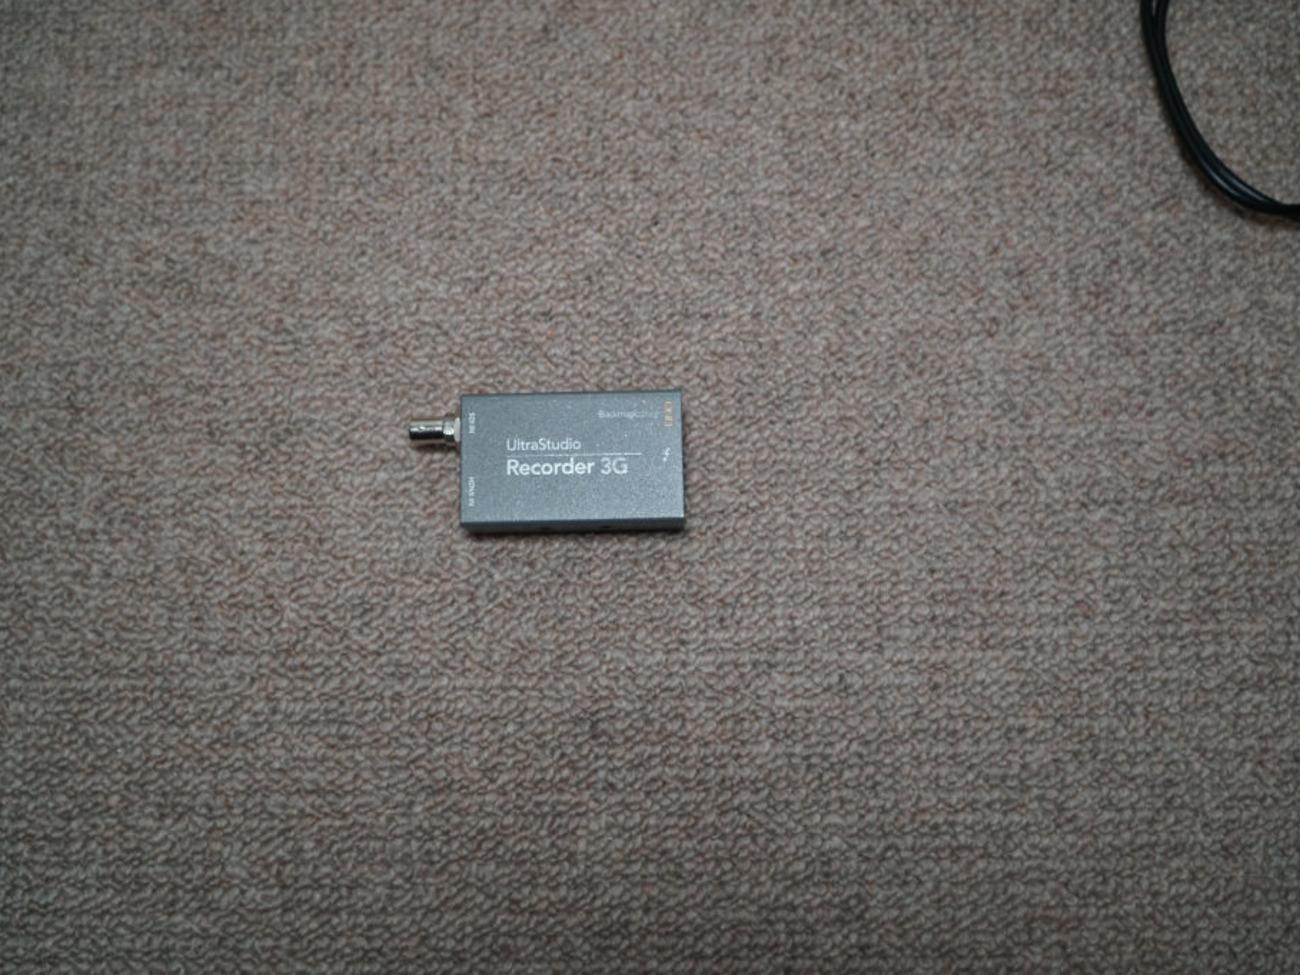 Rent Blackmagic Design Ultrastudio Recorder 3g Thunderbolt Hdmi Cables In London Rent For 10 00 Day 5 71 Week